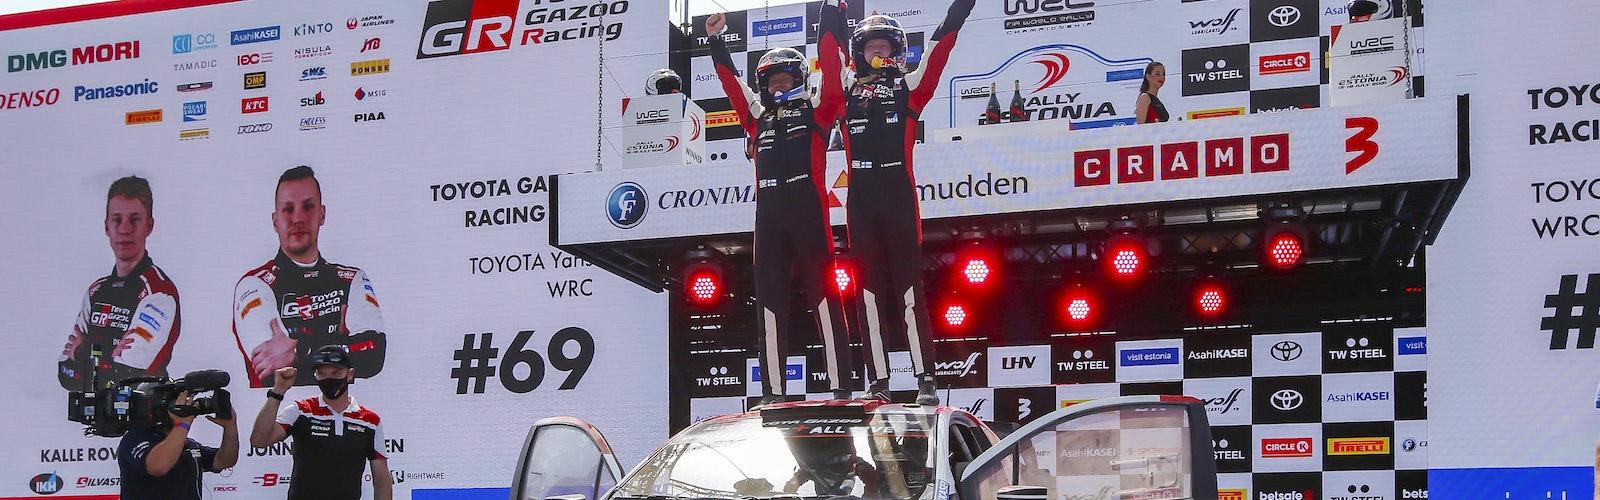 WRC_2021_Rd.7_361